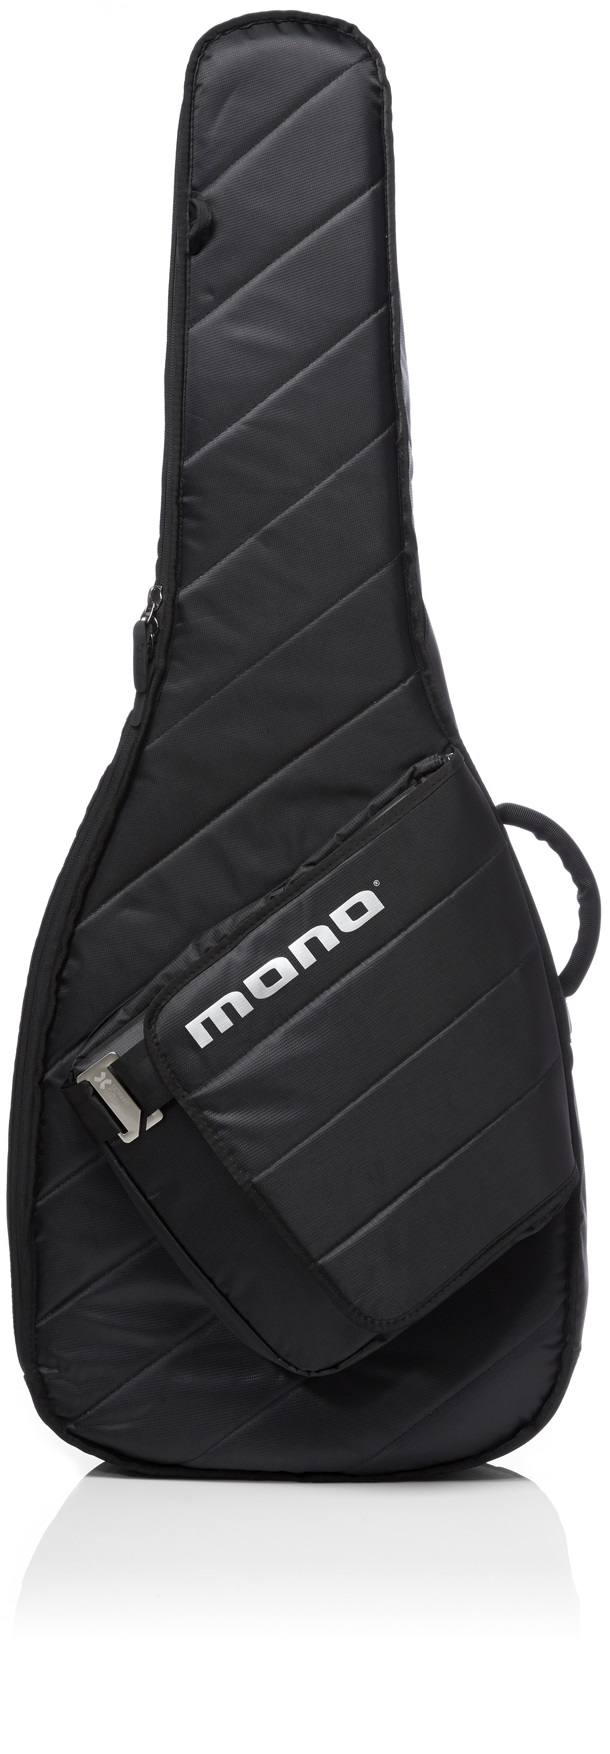 Mono Acoustic Sleeve Black